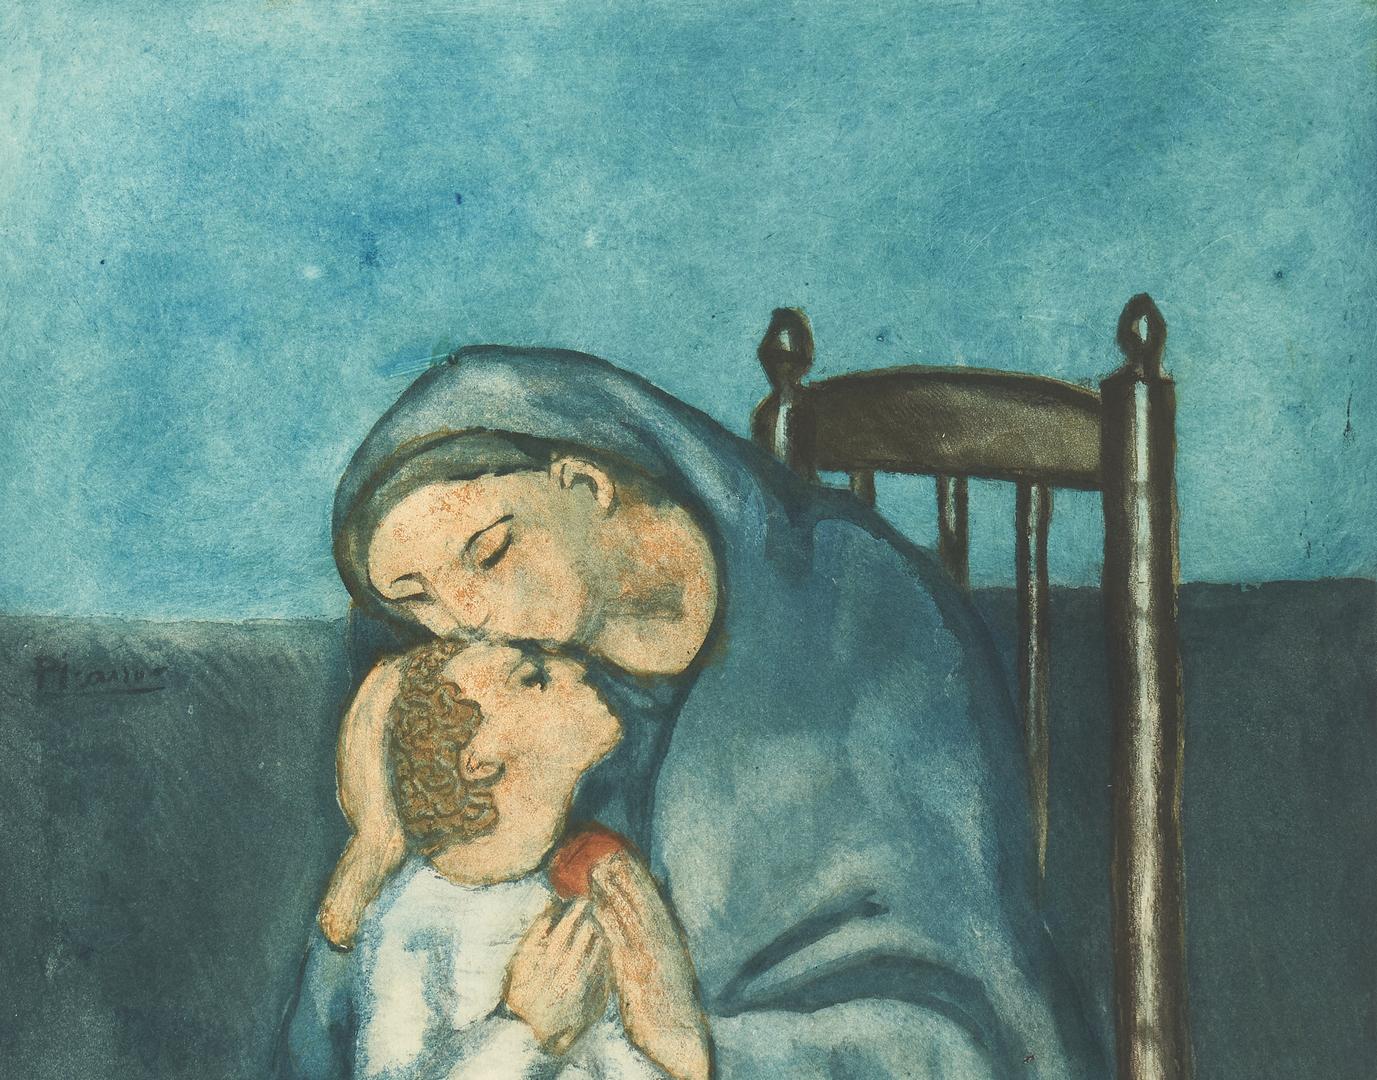 Lot 883: 2 J. Villon aquatints, Picasso and Modigliani, Mothers and Children